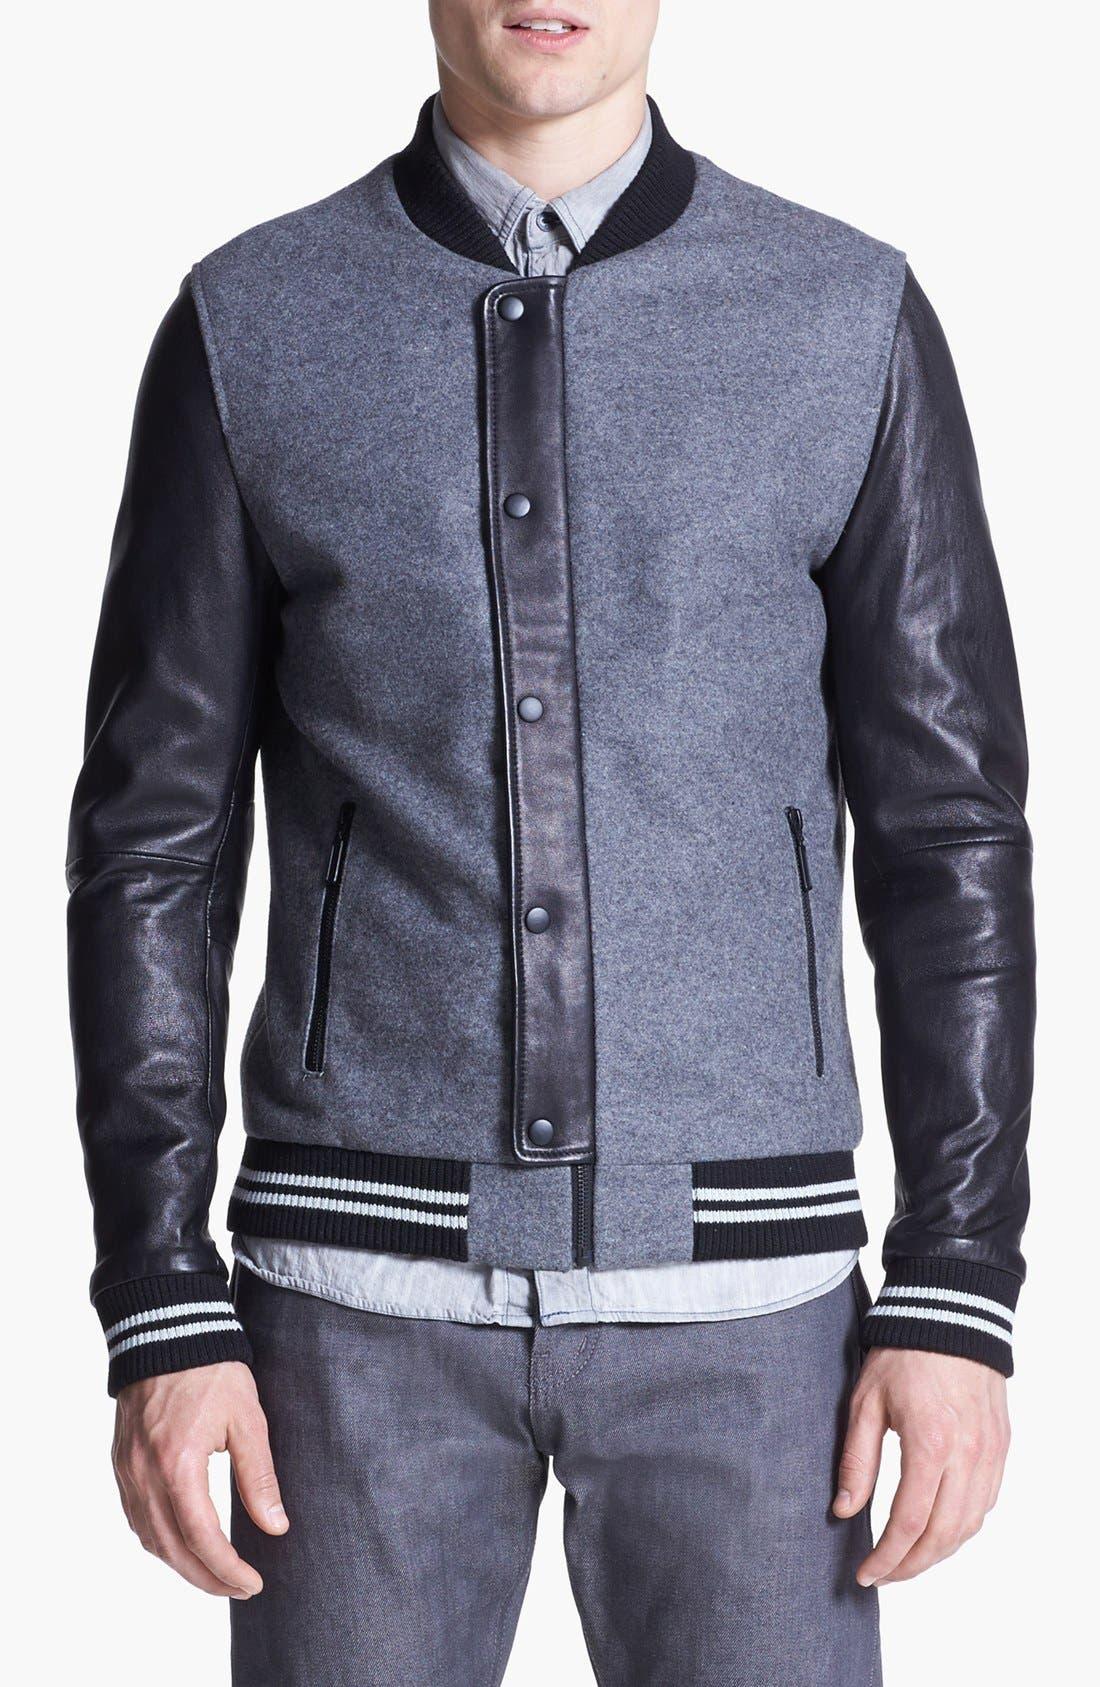 Alternate Image 1 Selected - 7 Diamonds 'Novara' Wool & Leather Varsity Jacket